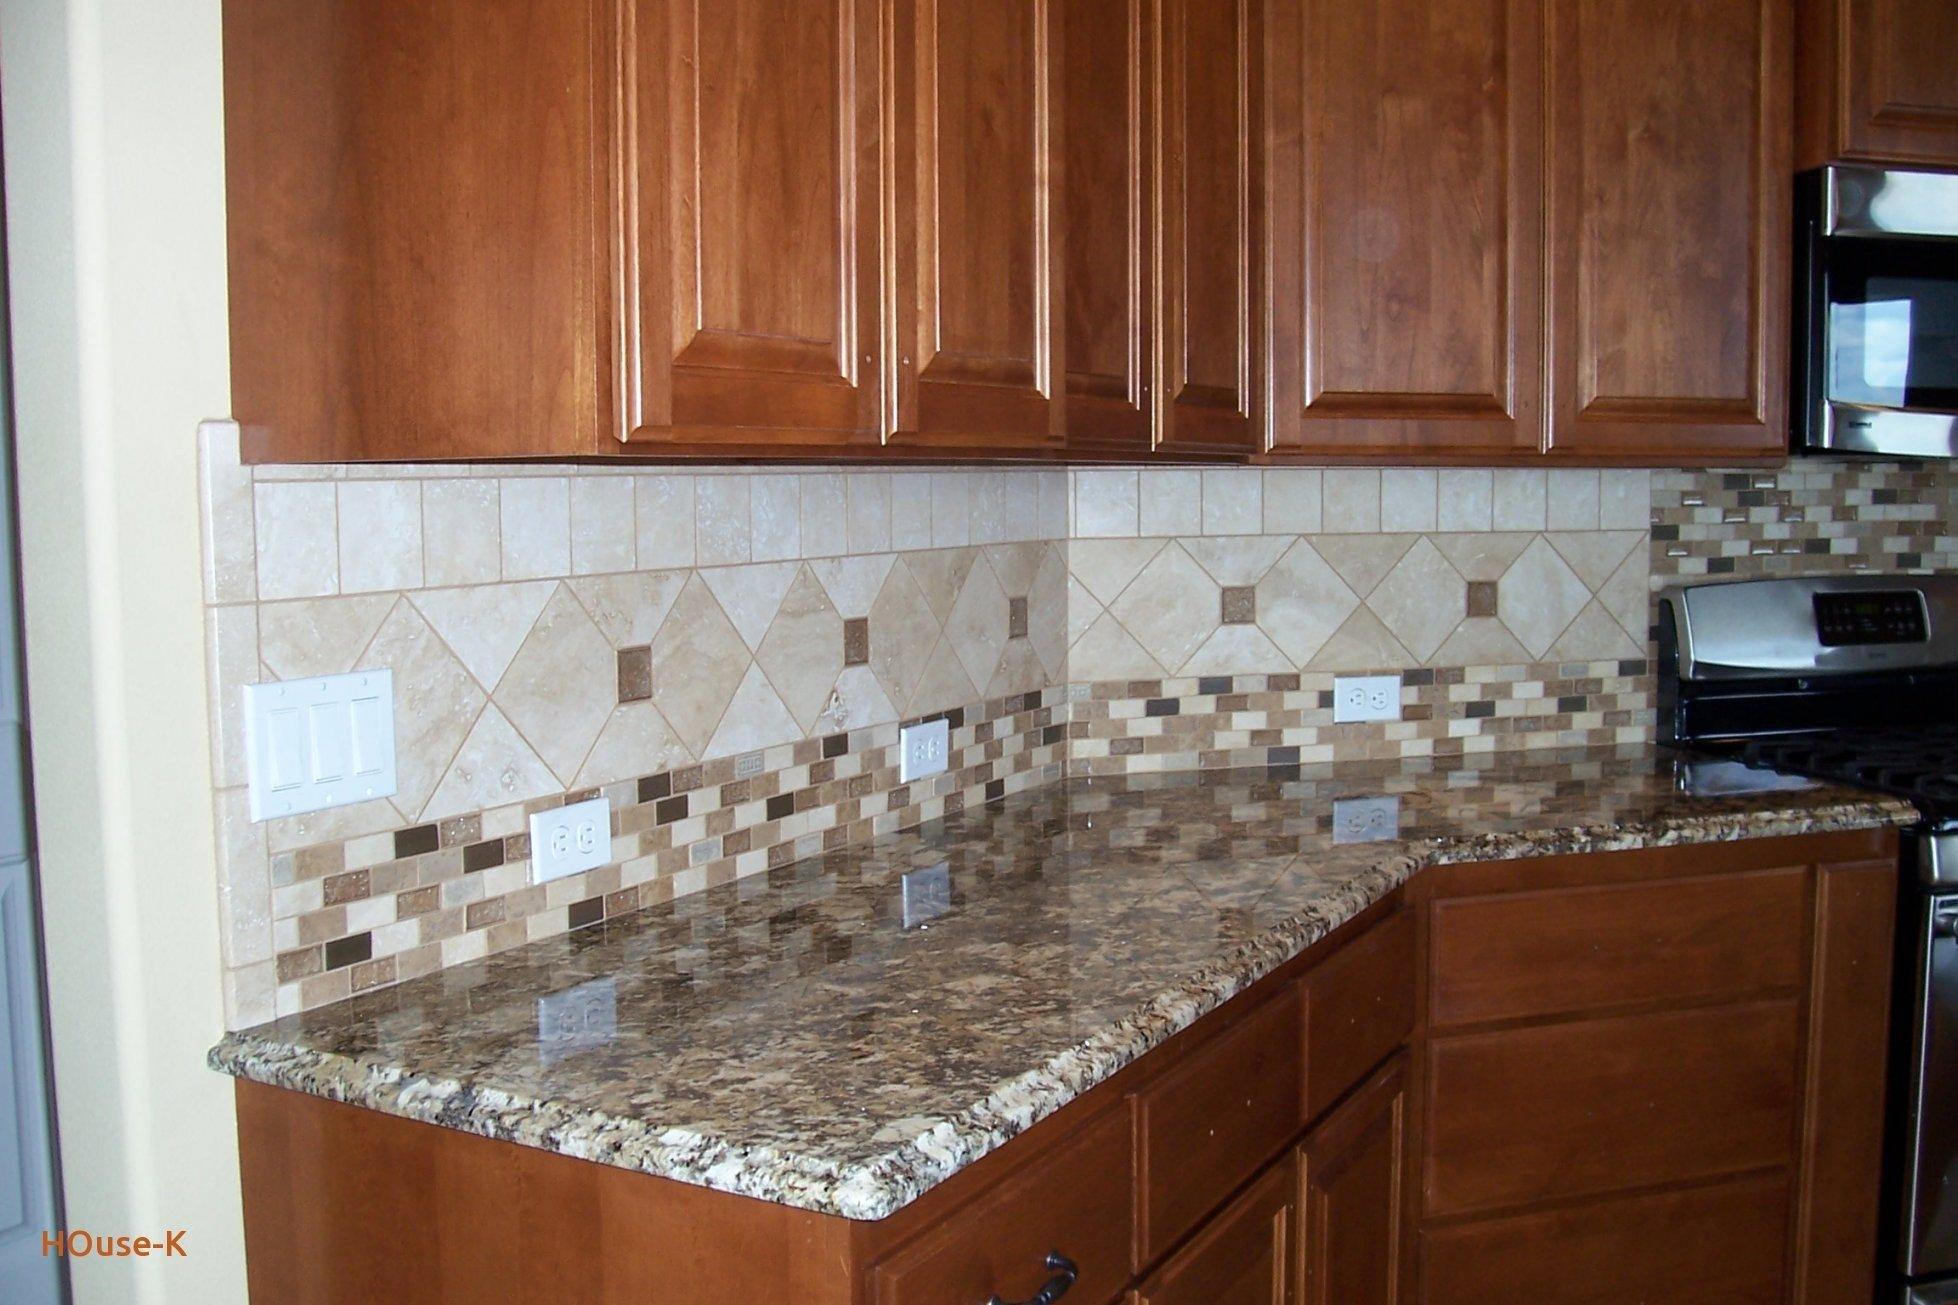 10 Pretty Ideas For Backsplash In Kitchen kitchen tile backsplash ideas inspirational easy to clean kitchen 2021